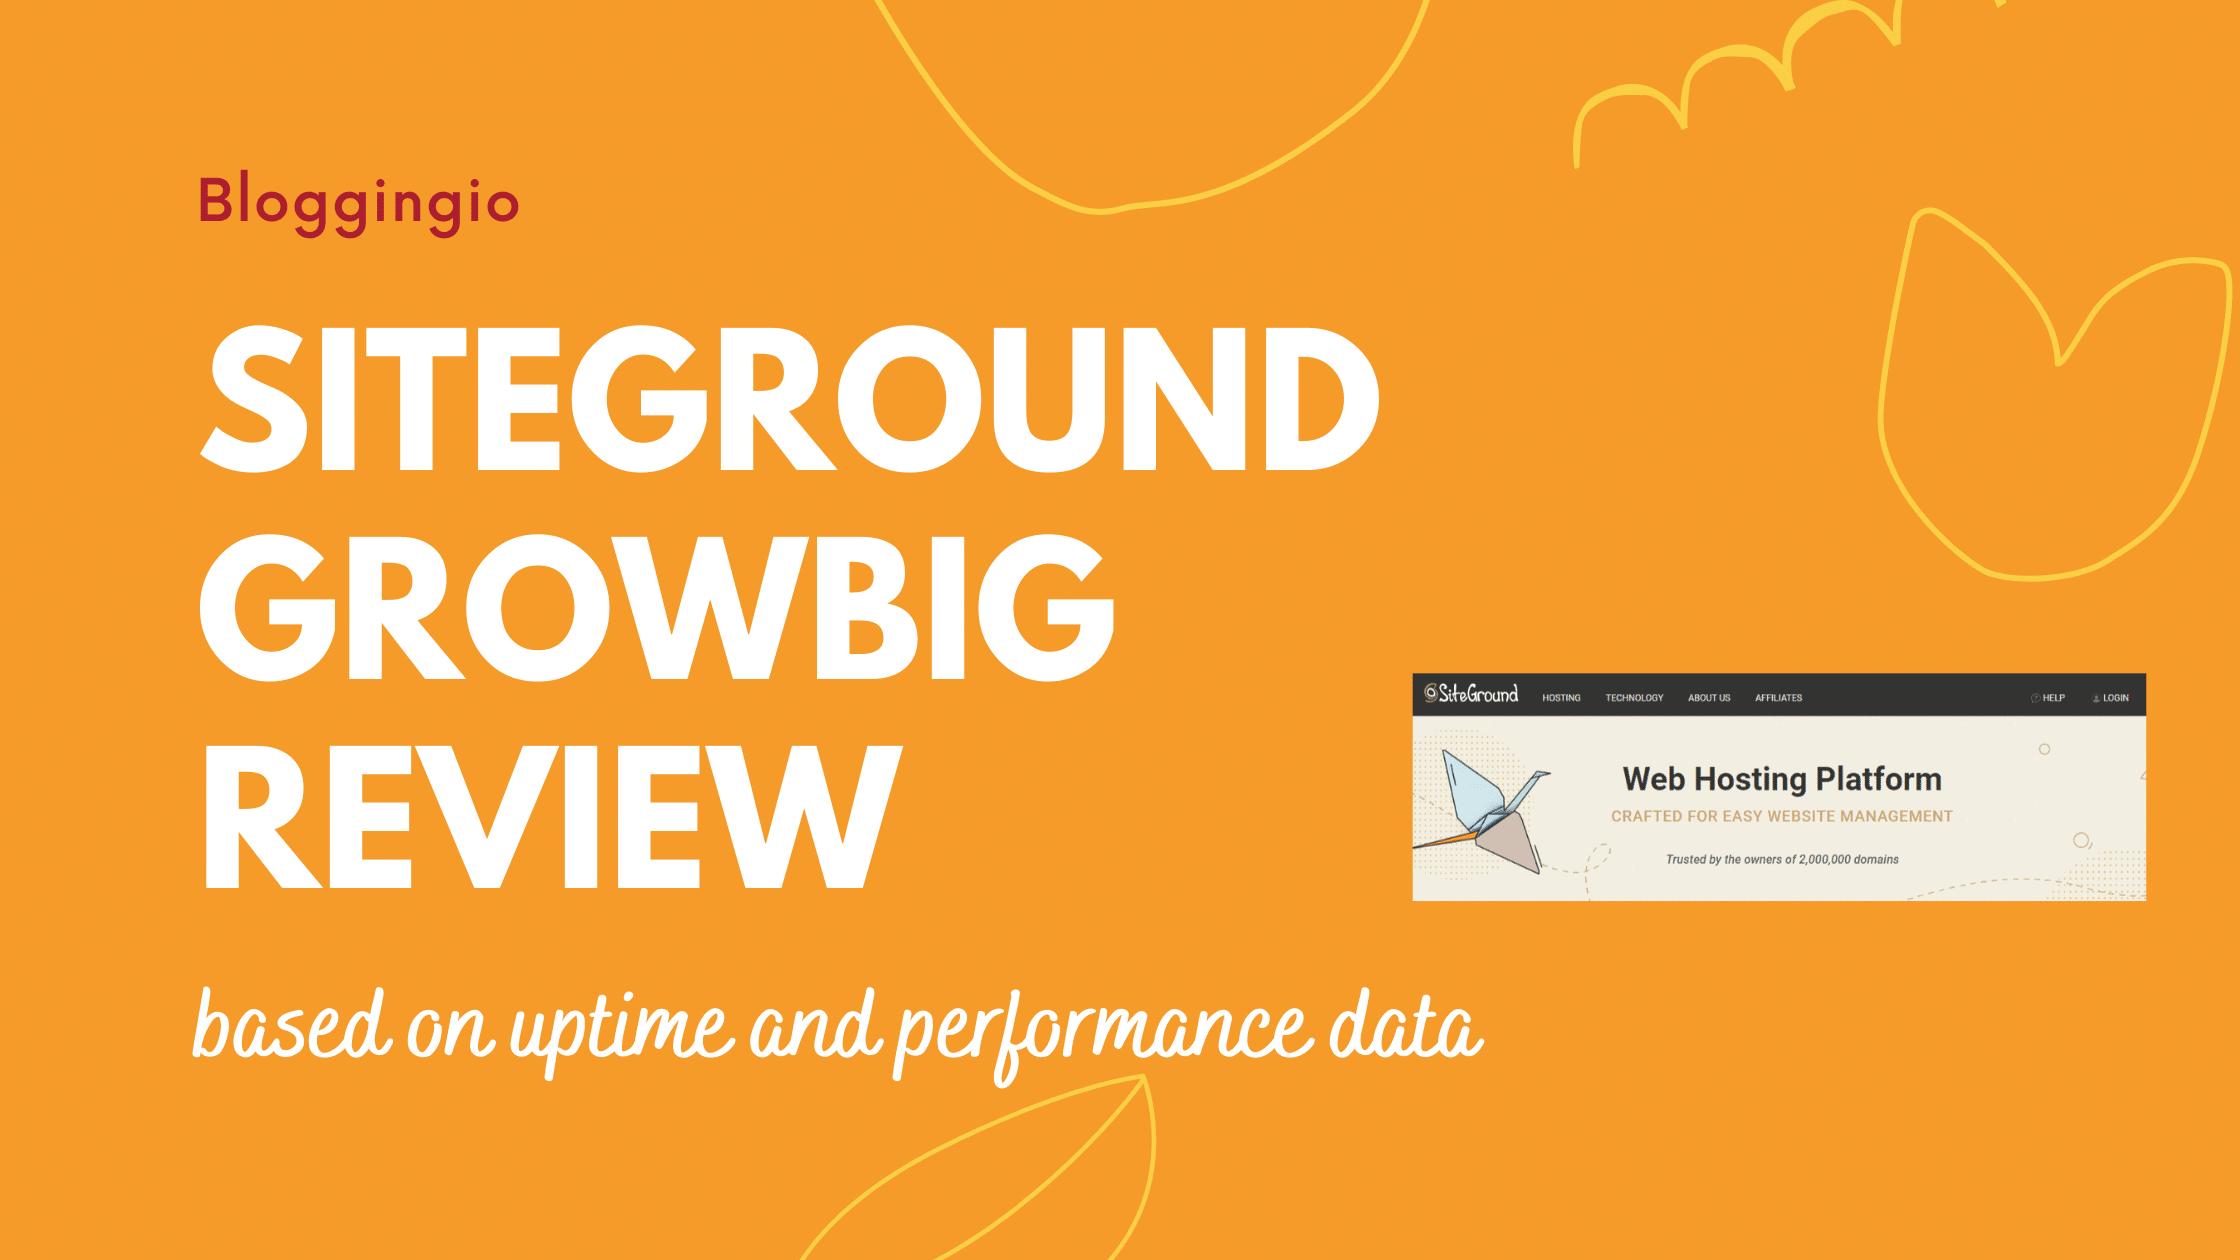 SiteGround Growbig Review